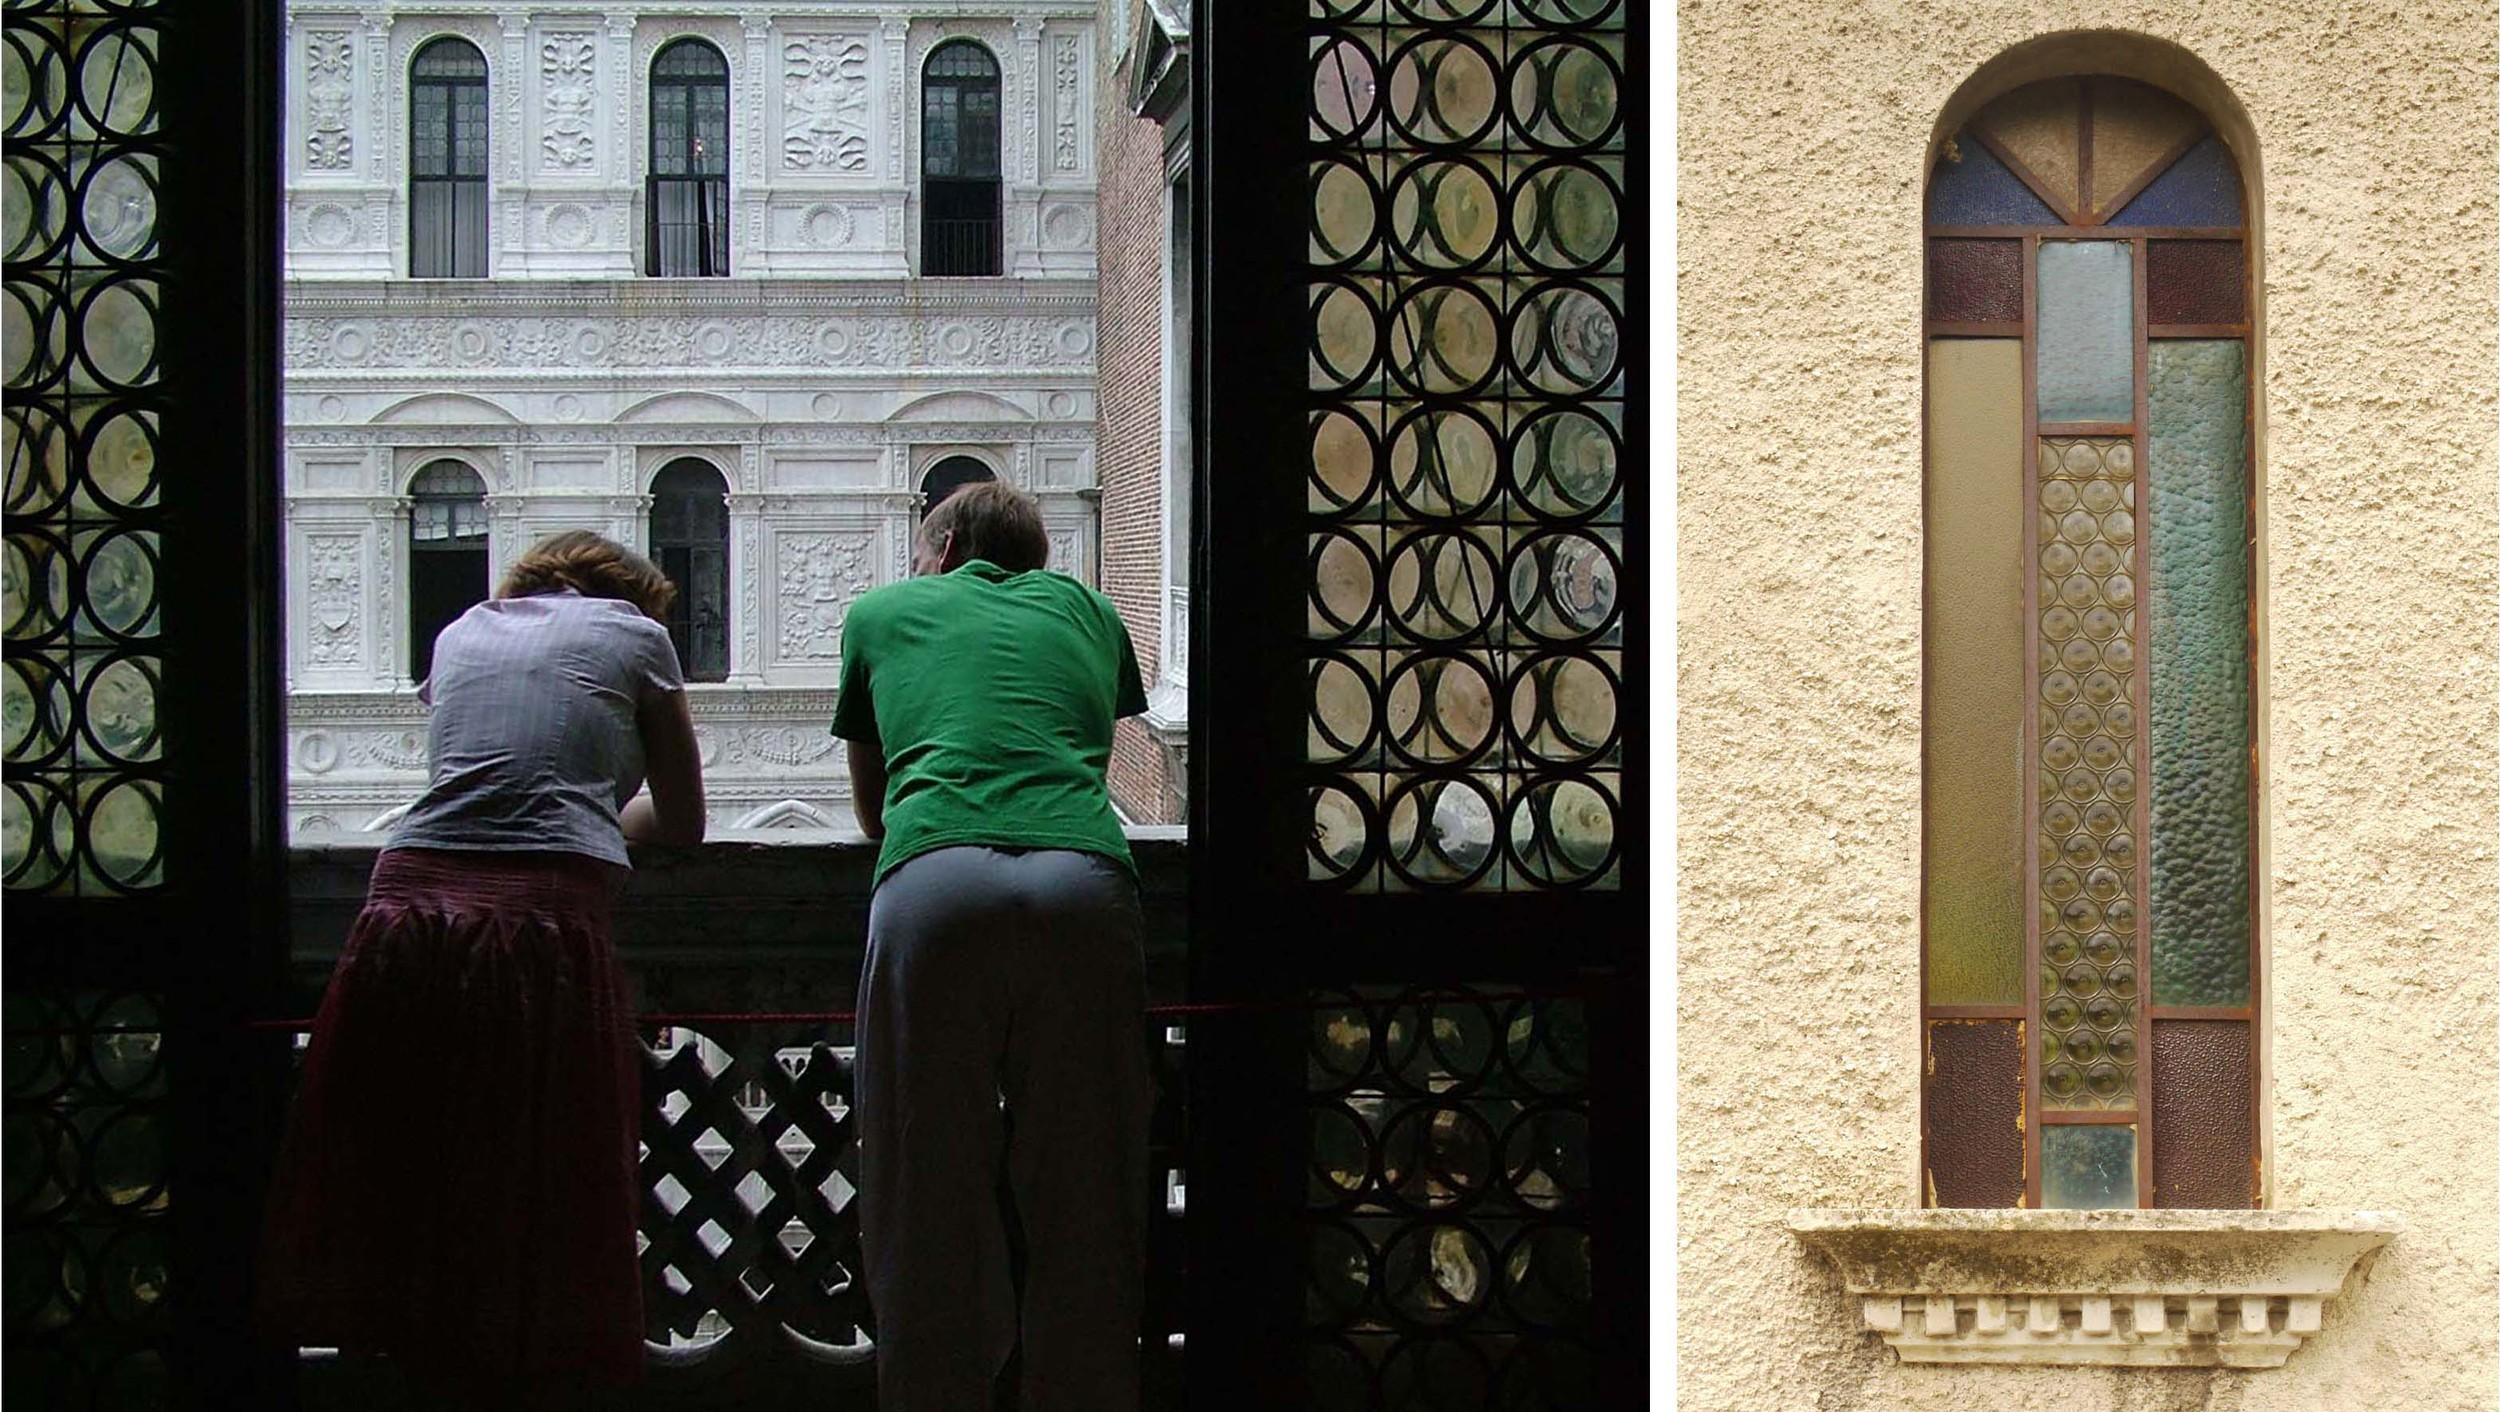 Inside the Doge's Palce, Venice                                     Chapel window, Gualdo Tadino, Umbria